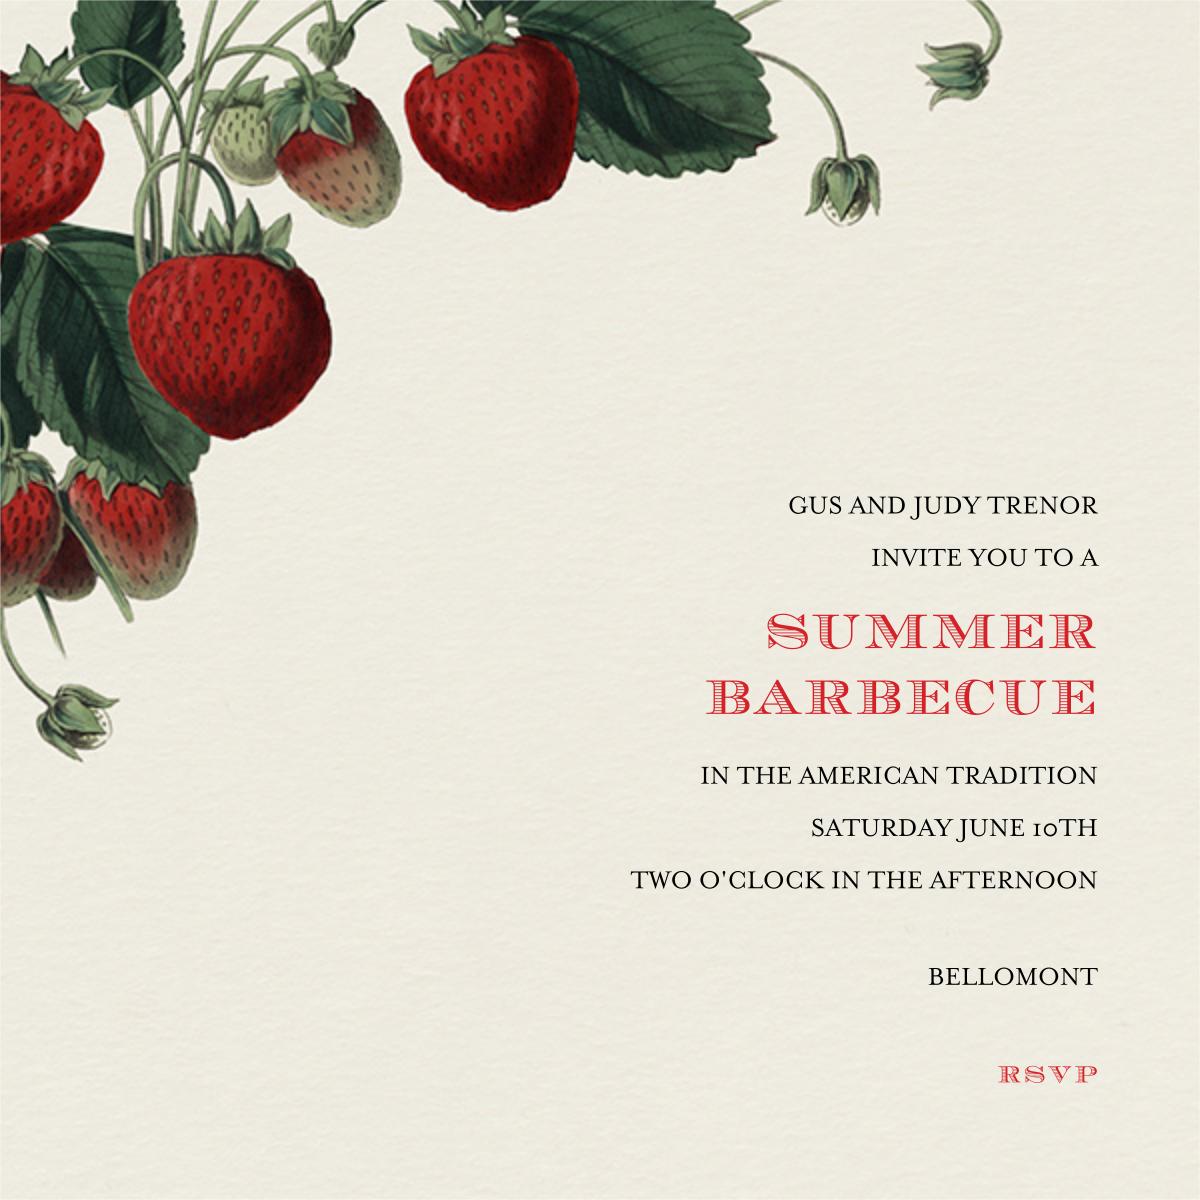 Strawberries (Square) - John Derian - Summer entertaining invitations